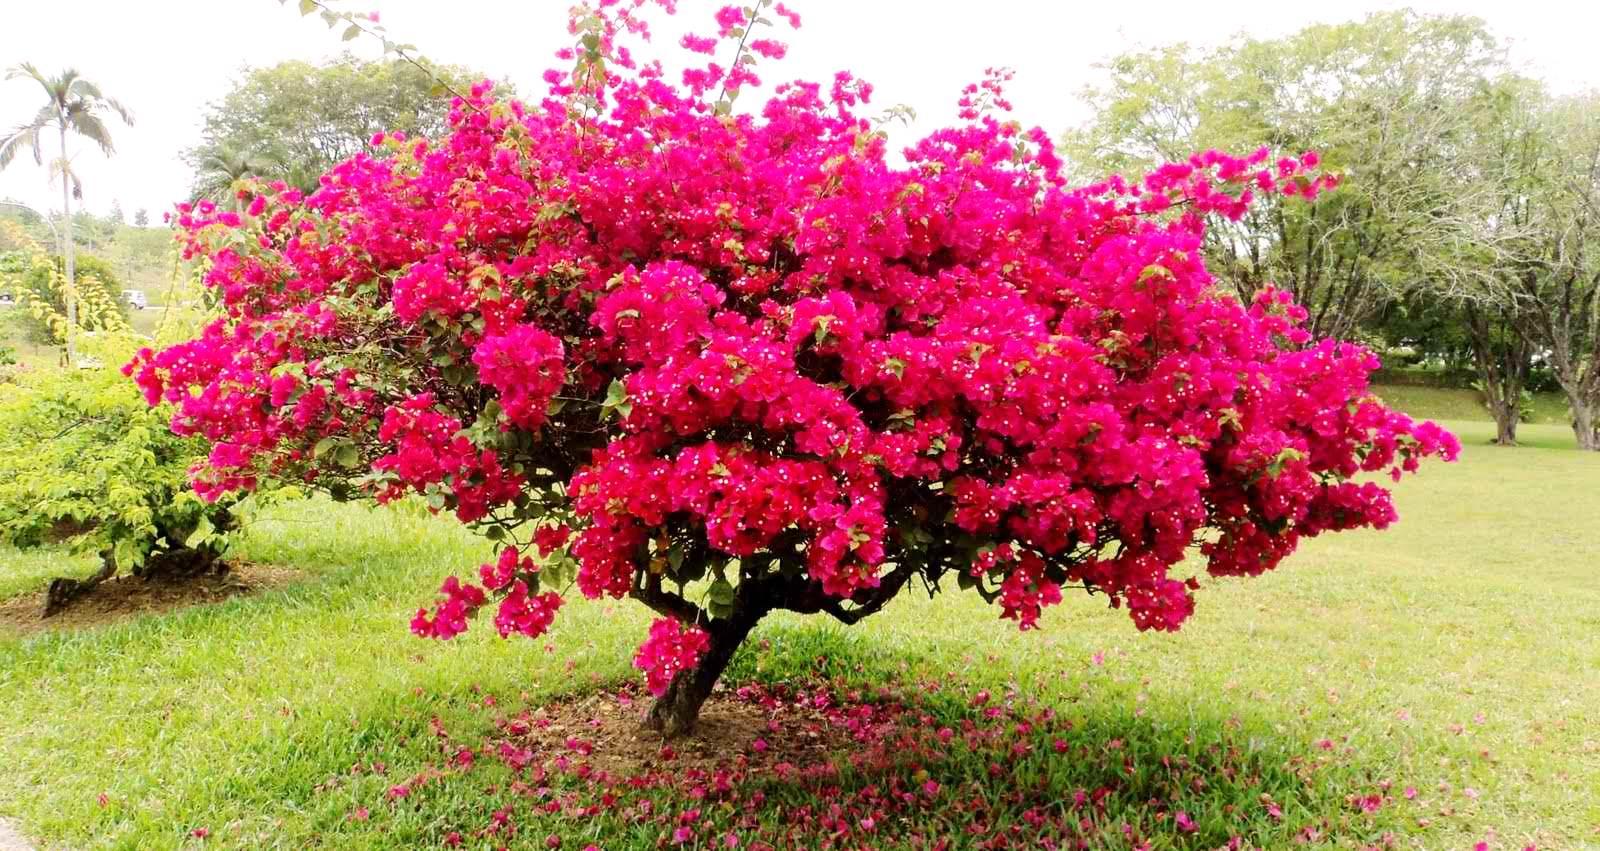 El Viajero: Paper Flowers: Bougainvillea in Bloom